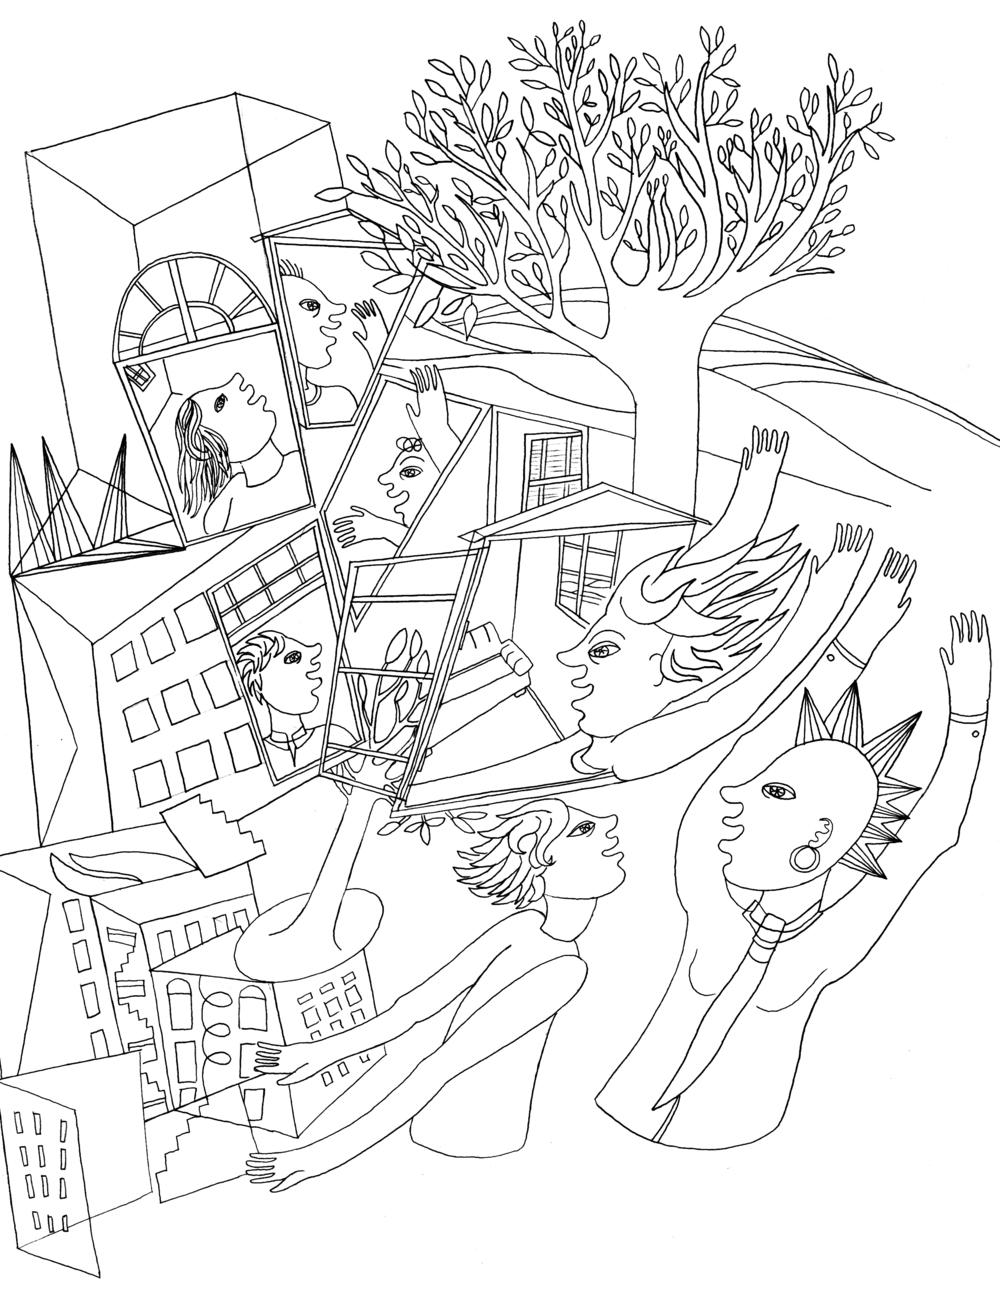 TSACOLORBOOK006.jpg